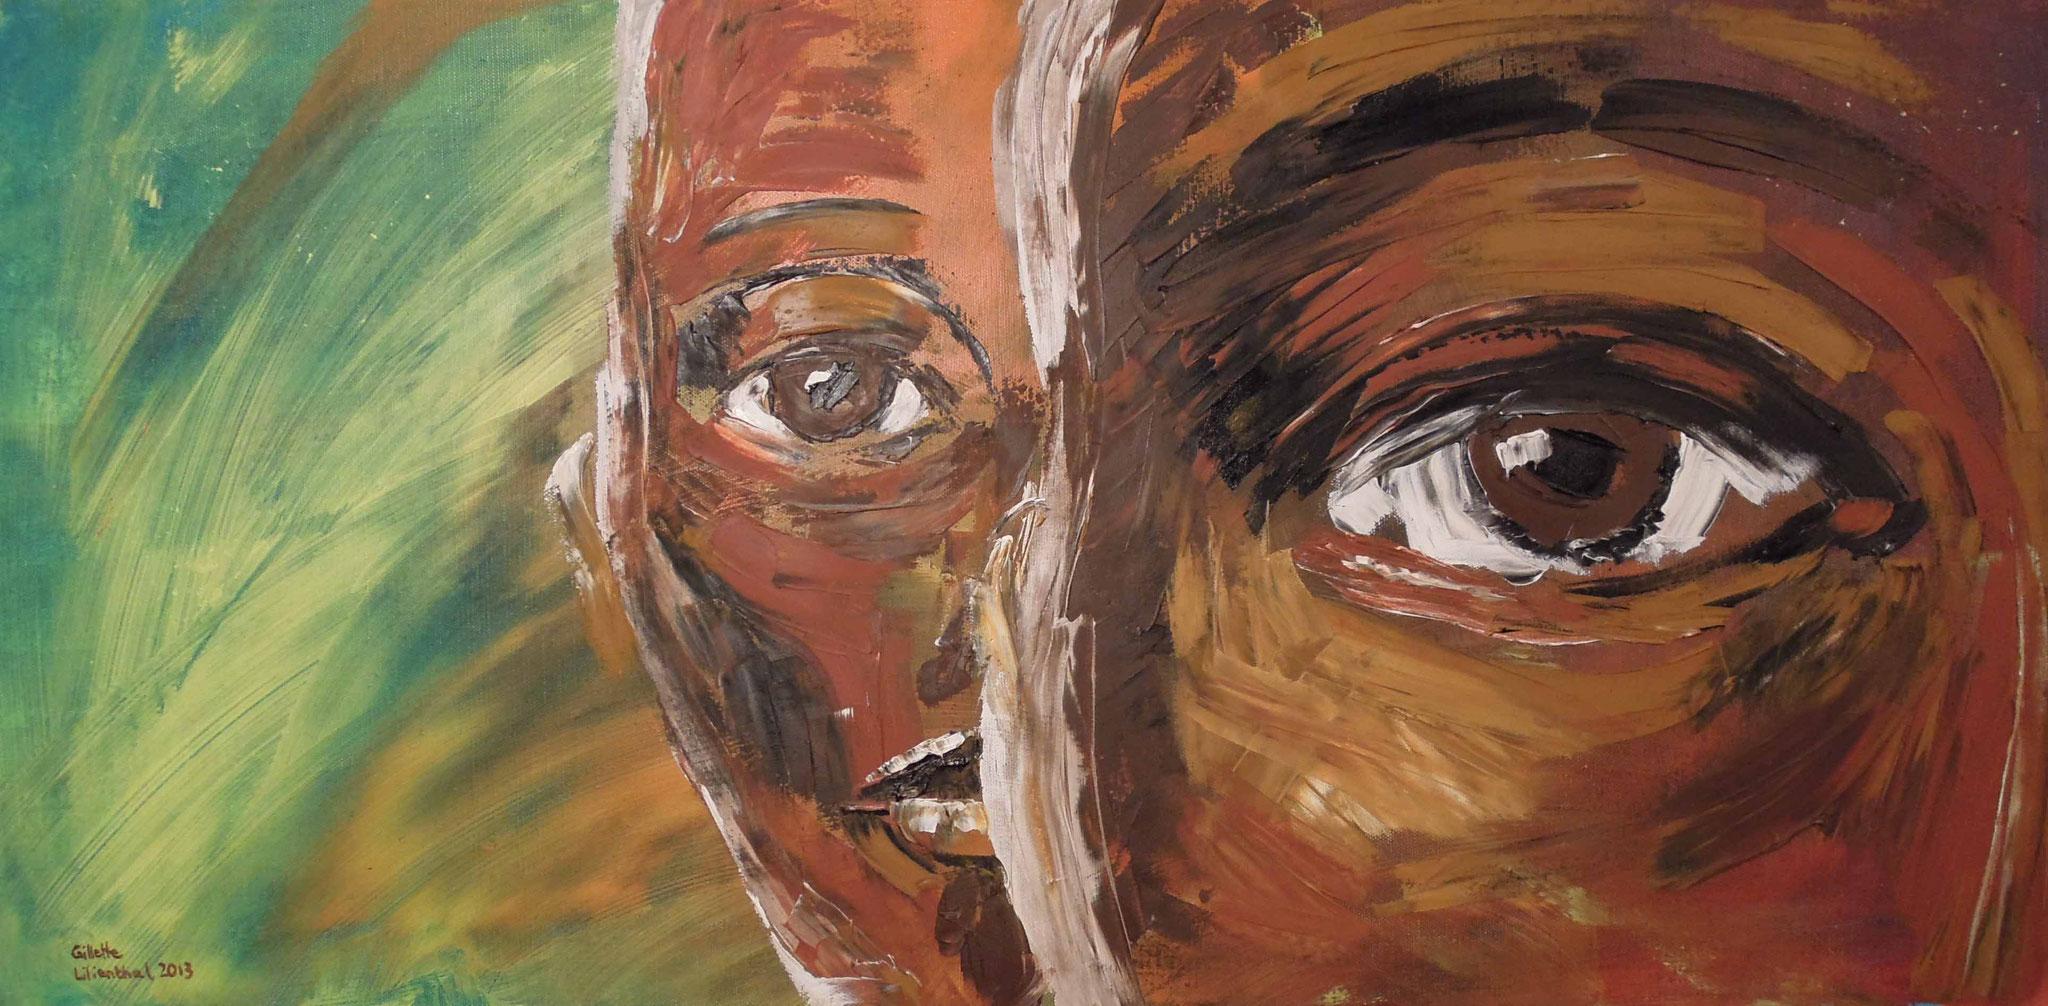 Double Take - Öl auf Leinwand 80 x 40 cm